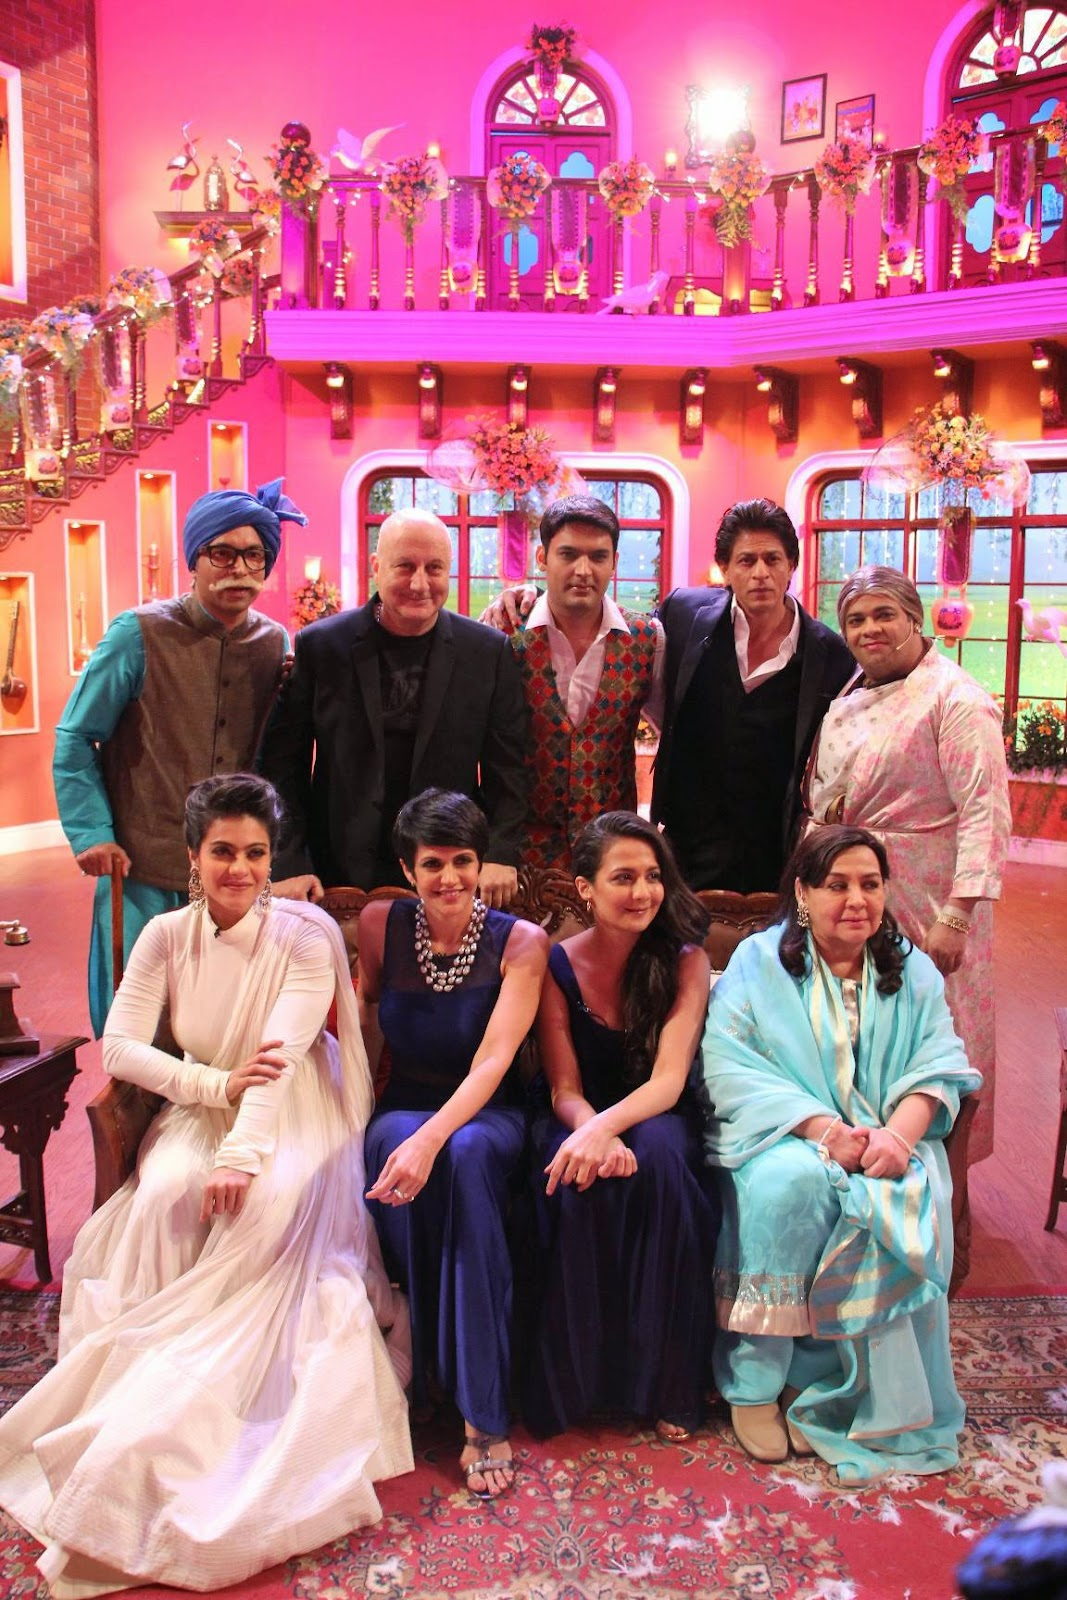 Dilwale Dulhania Le Jayenge Movie 1000 Weeks Celebrations On Comedy Nights With Kapil Sets, Shah Rukh Khan-Kajol DDLJ Team on CNWK